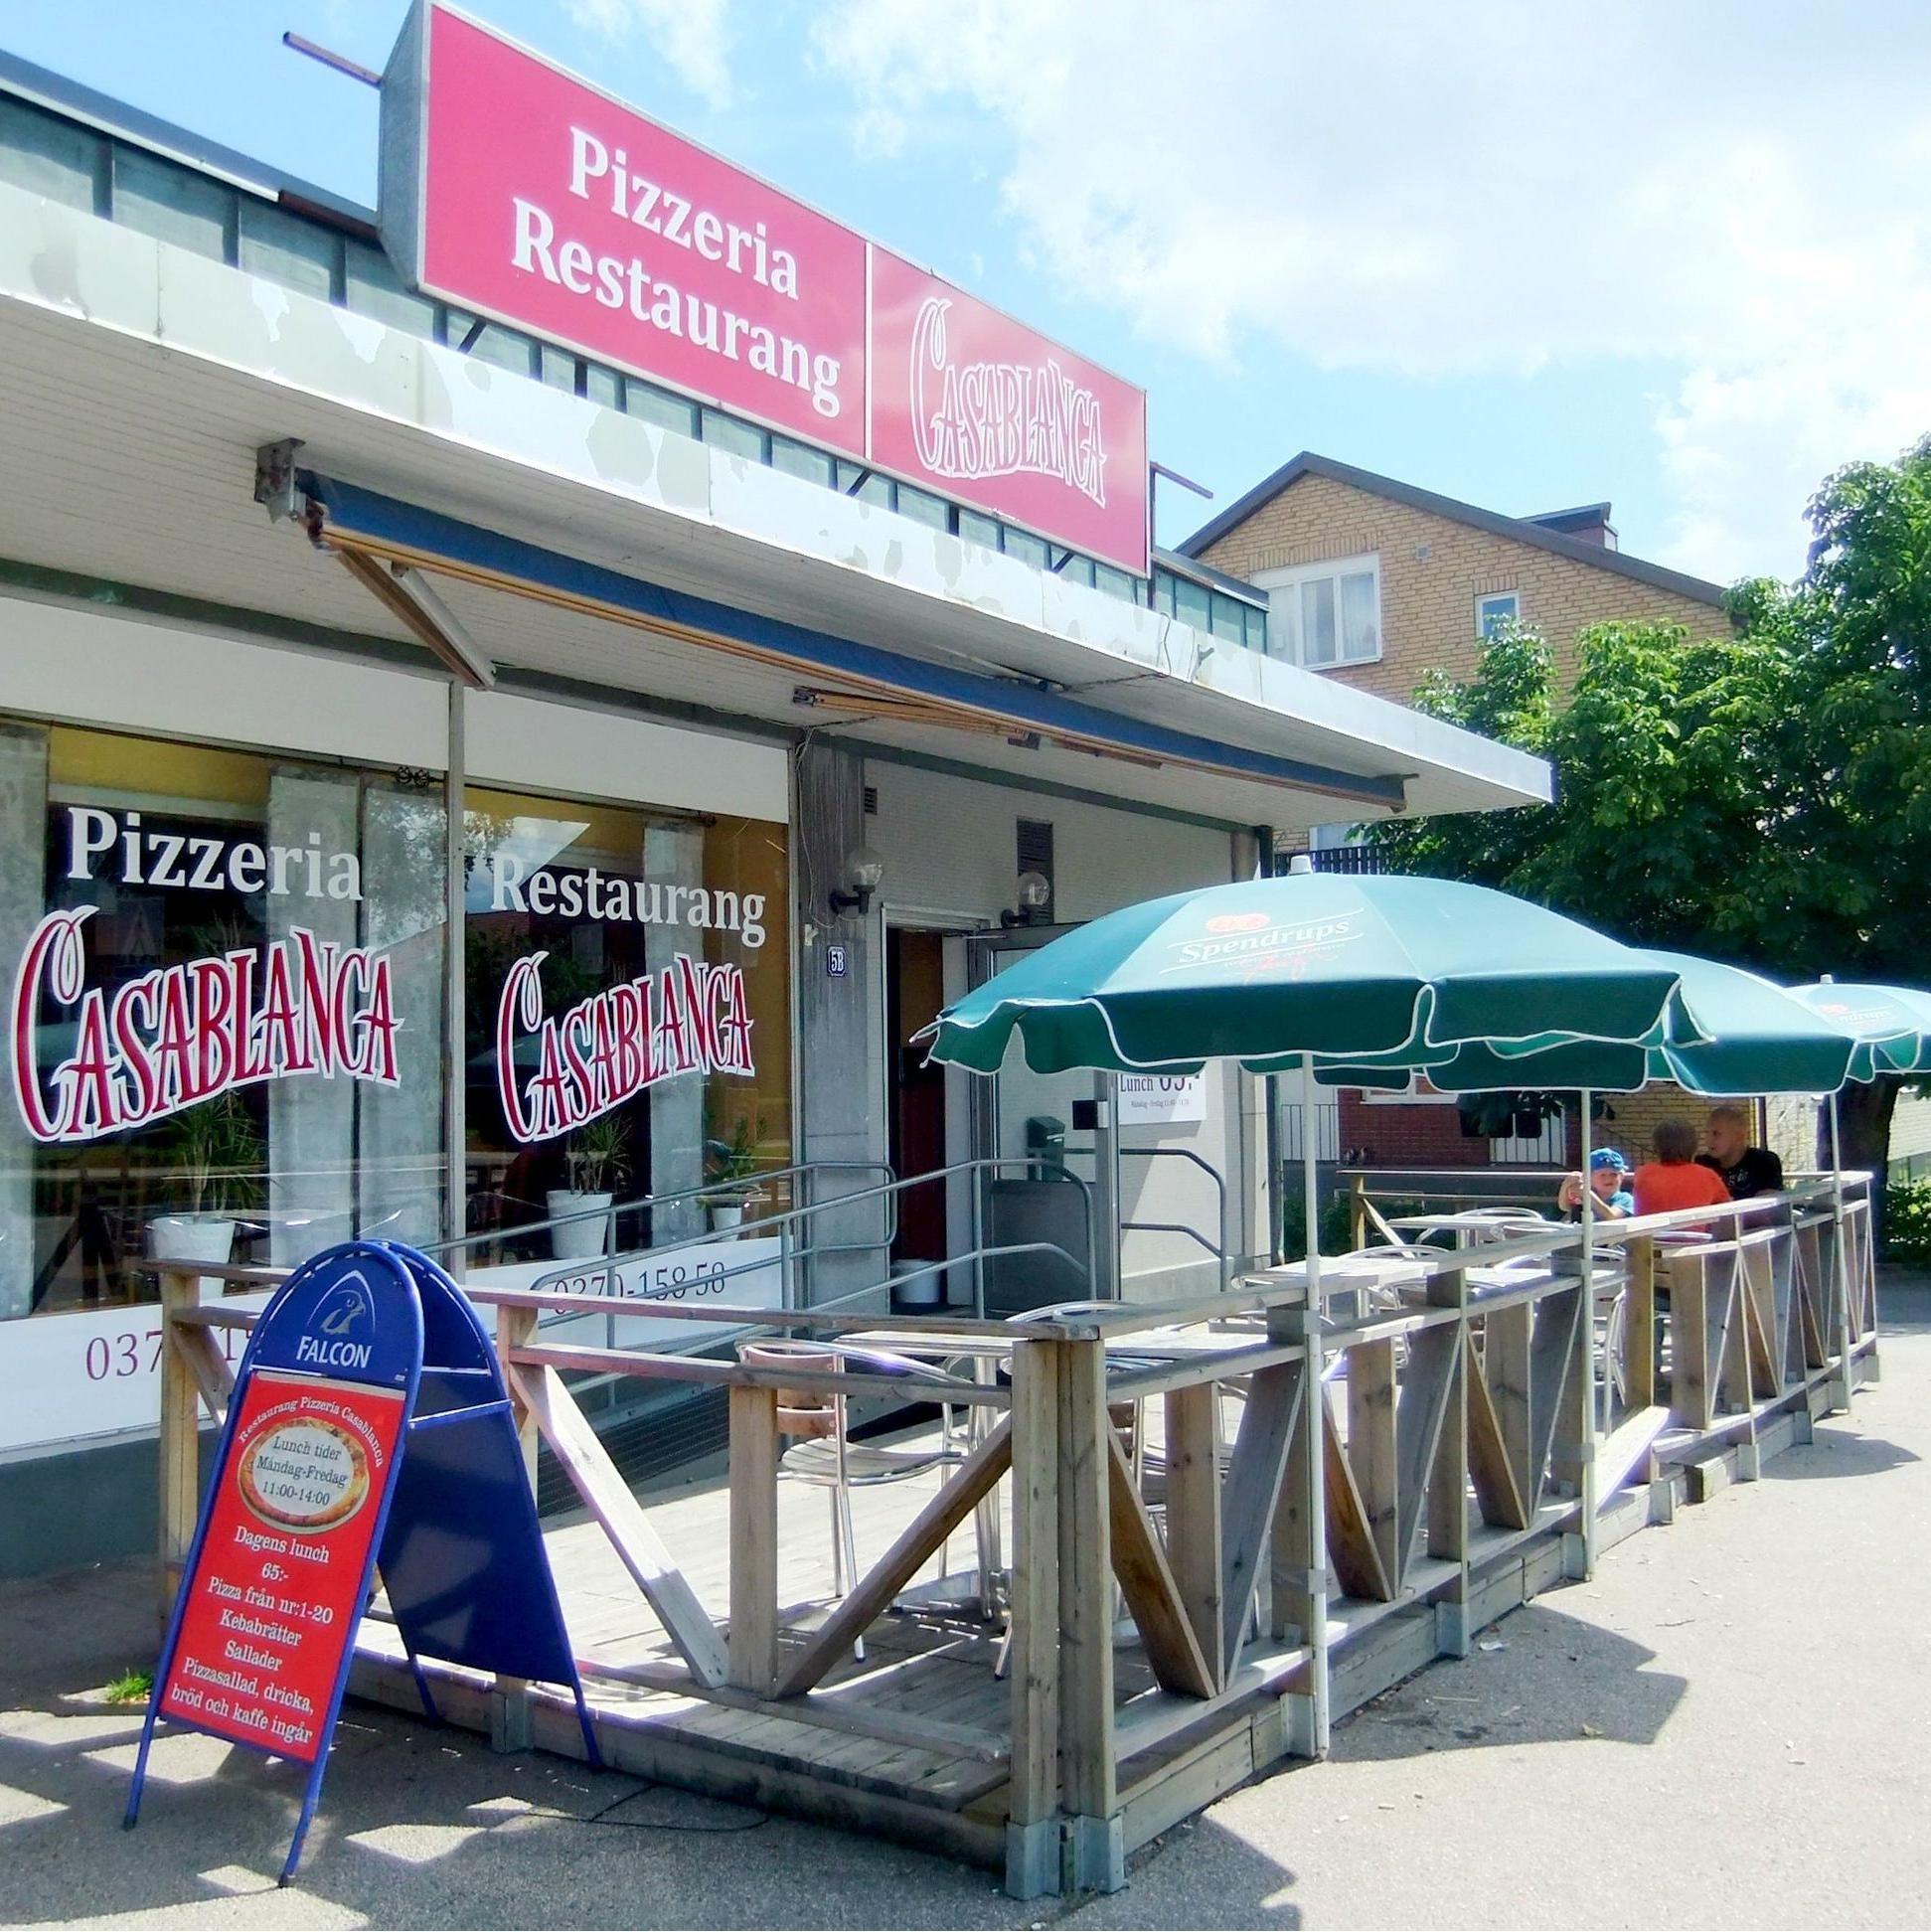 Pizzeria & Restaurang Casablanca